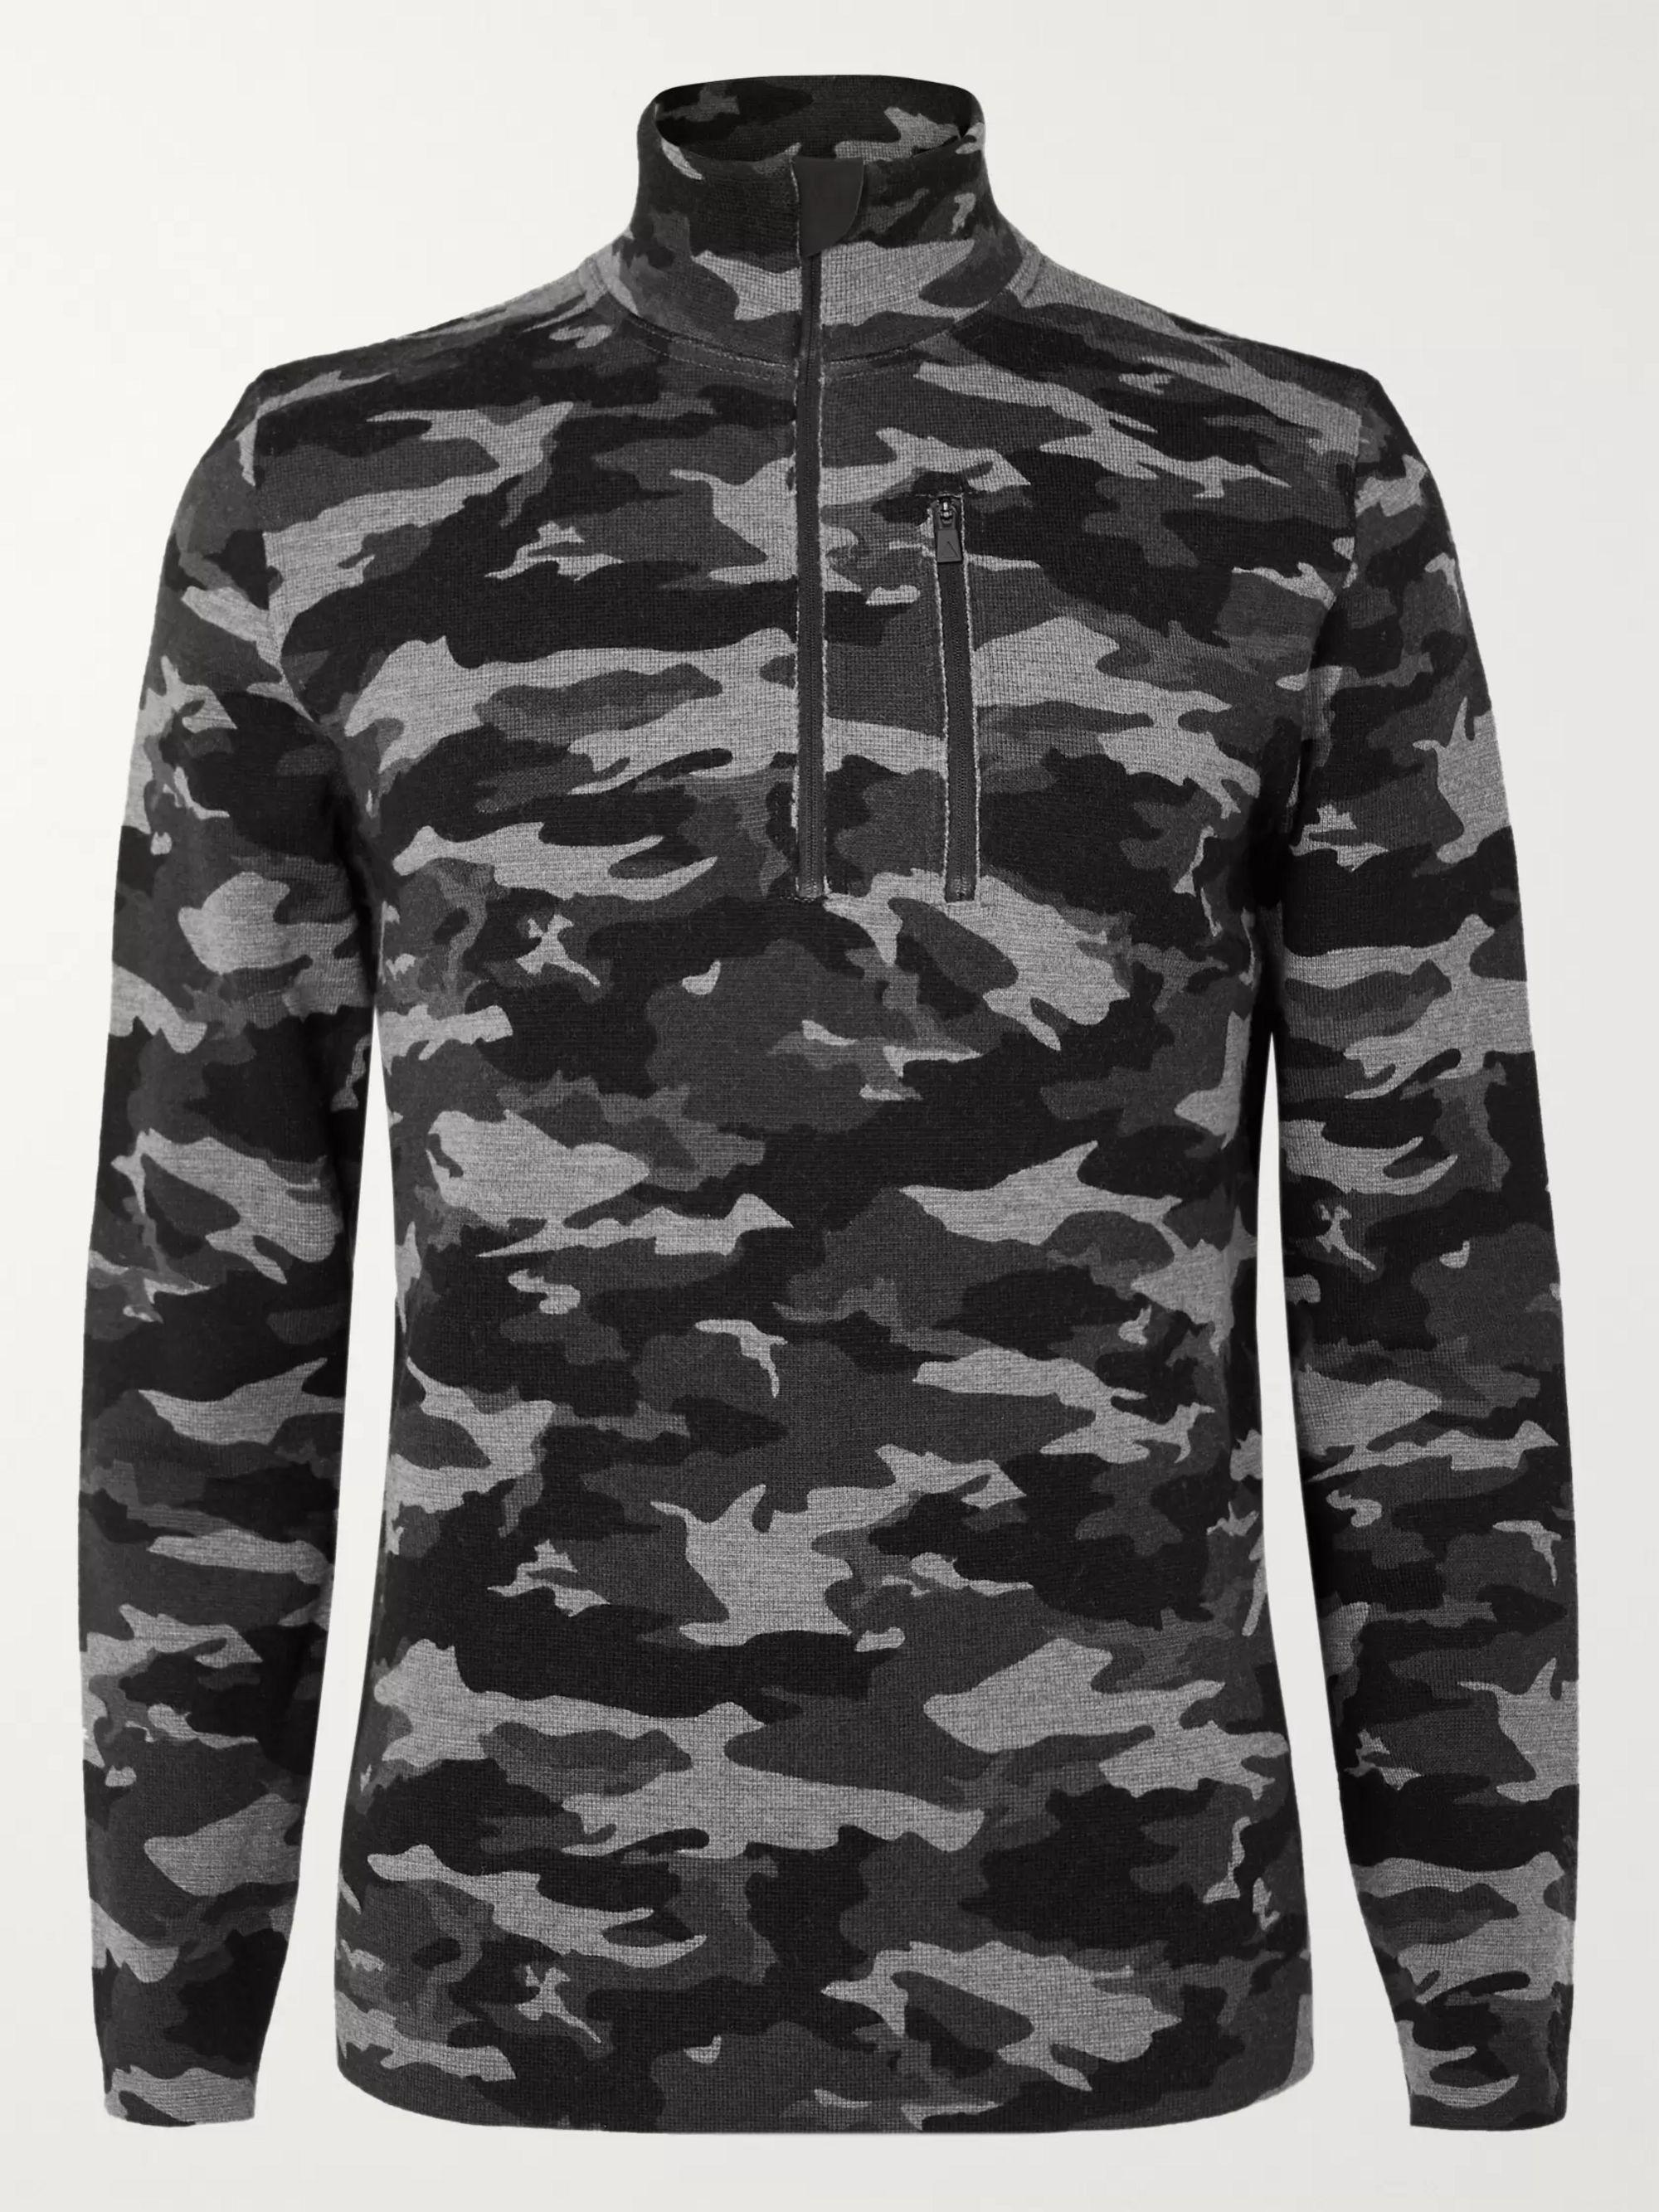 Gray Matterhorn Nylon-Panelled Camouflage-Print Merino Wool Base Layer | Aztech Mountain | MR PORTER